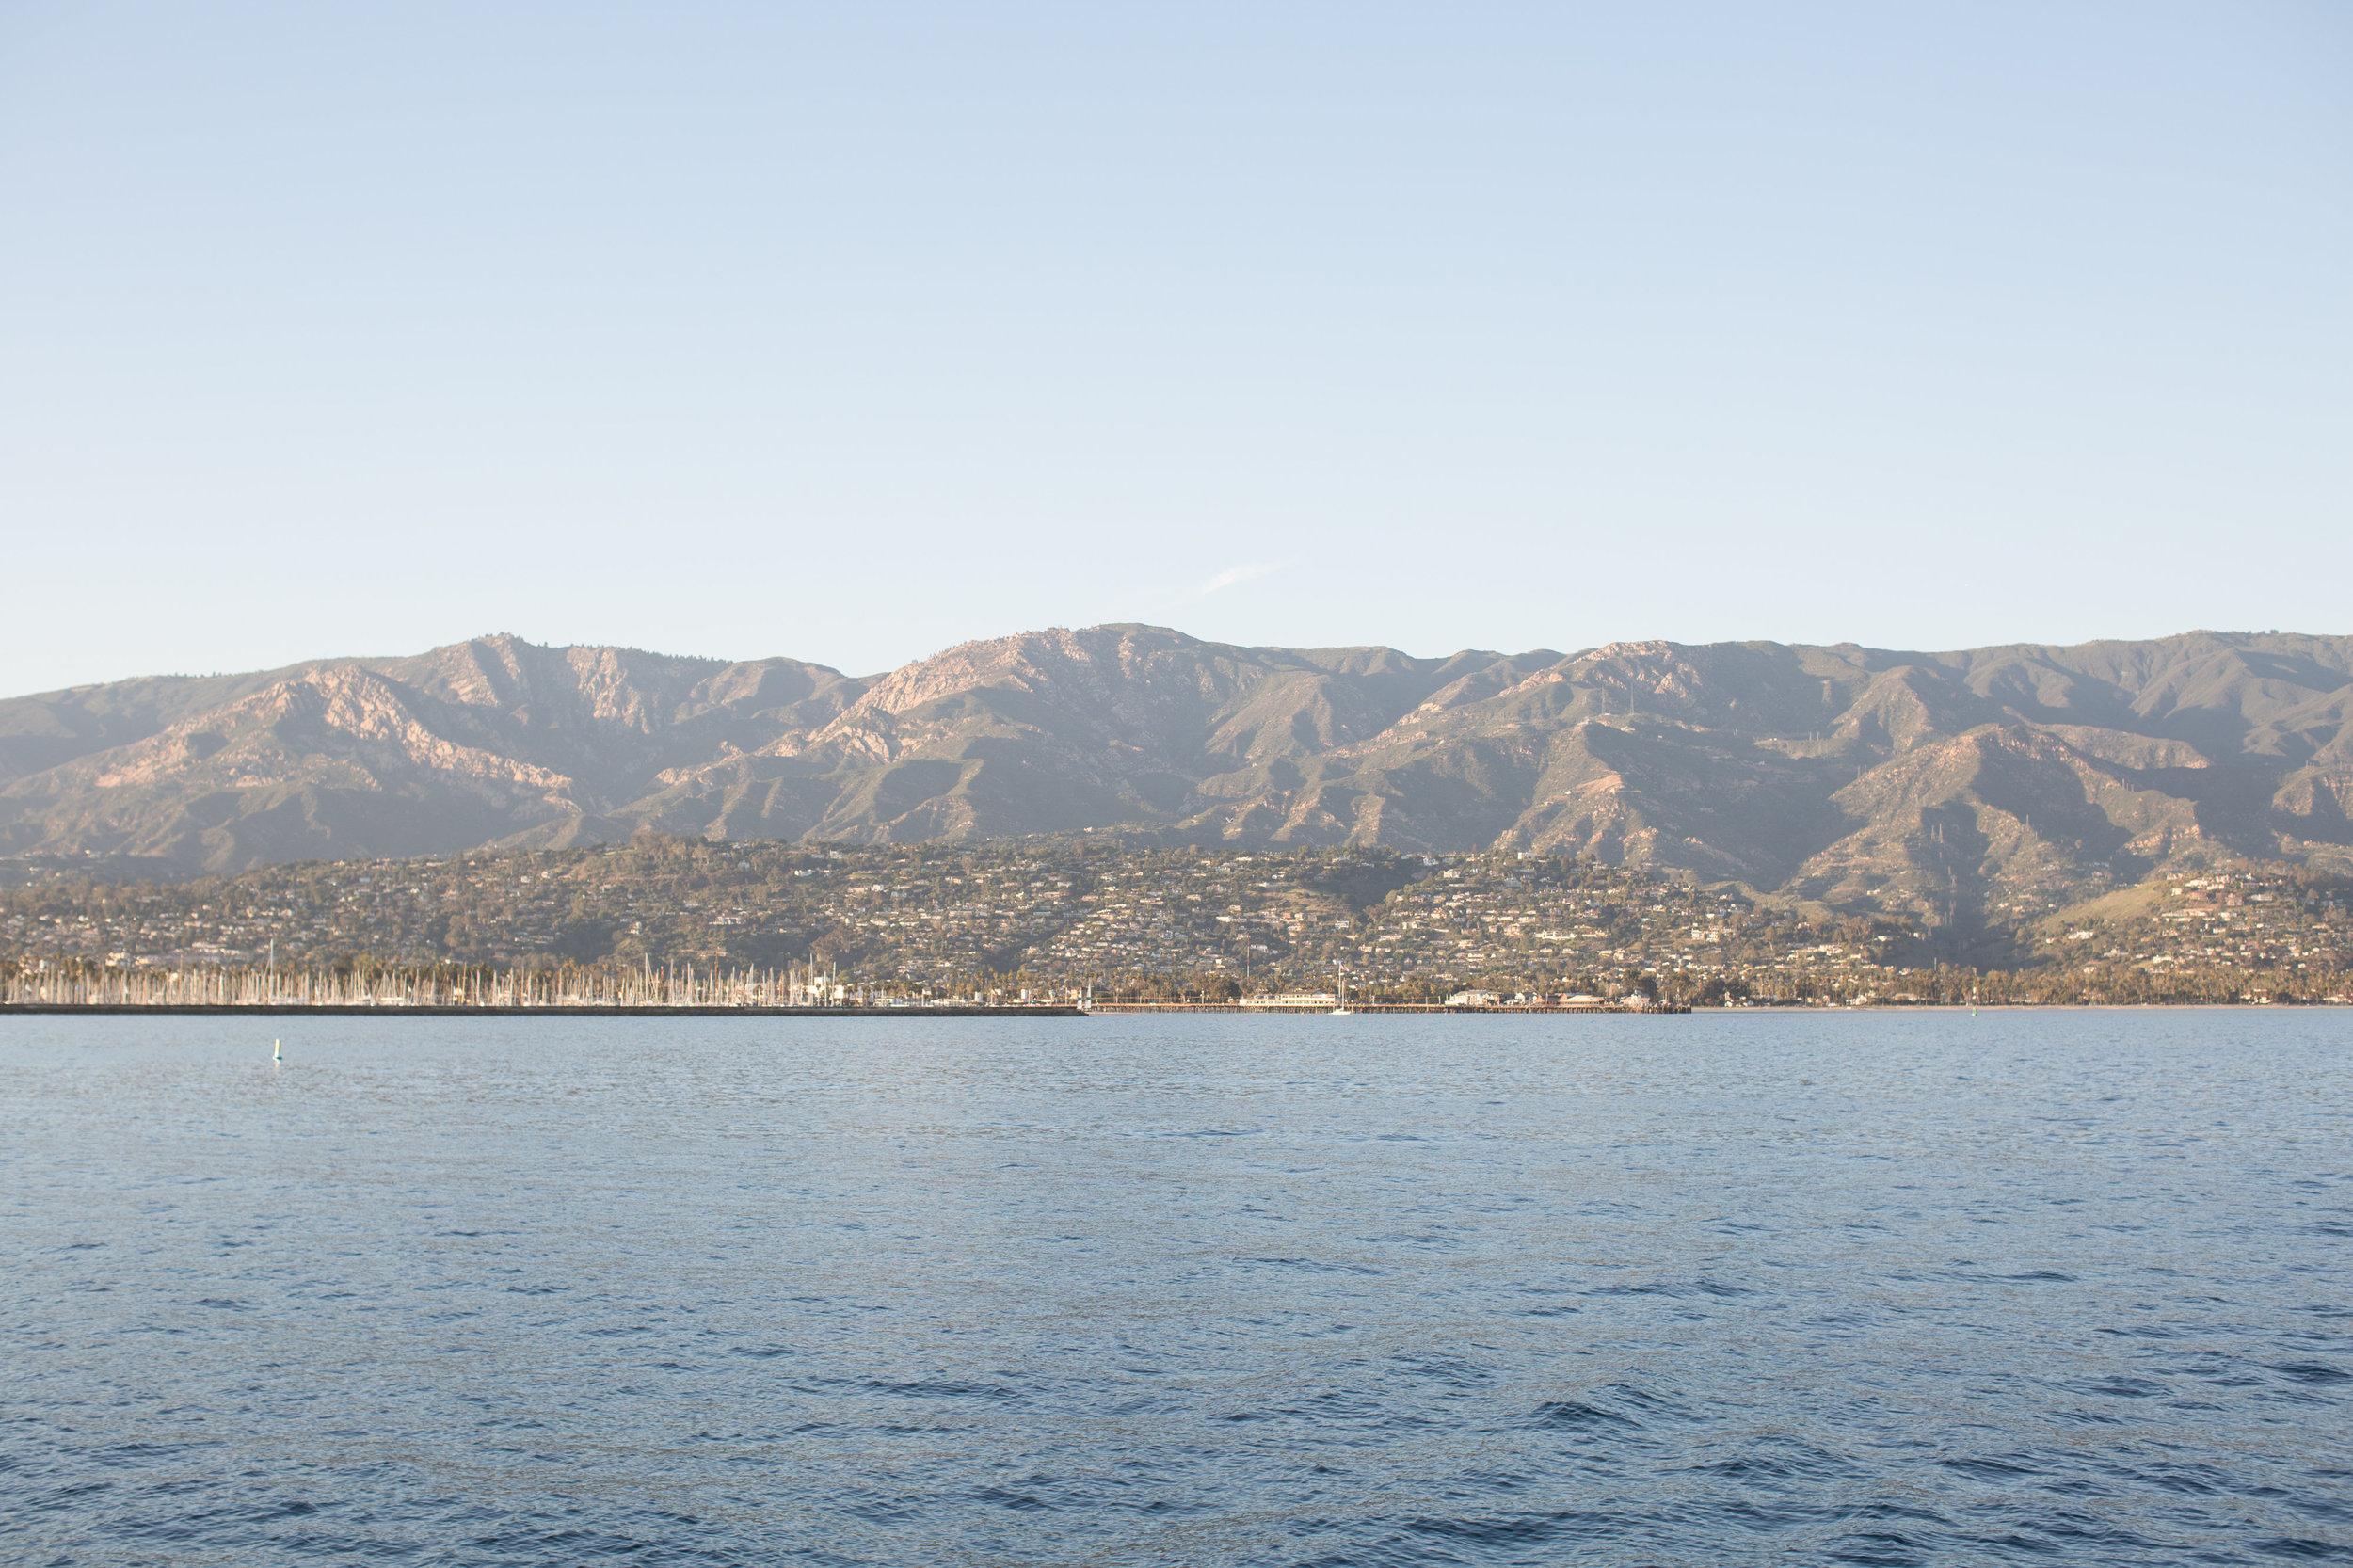 santa-barbara-elopement-courthouse-wedding-azure-seas-yacht-cruise-reception (18).jpg